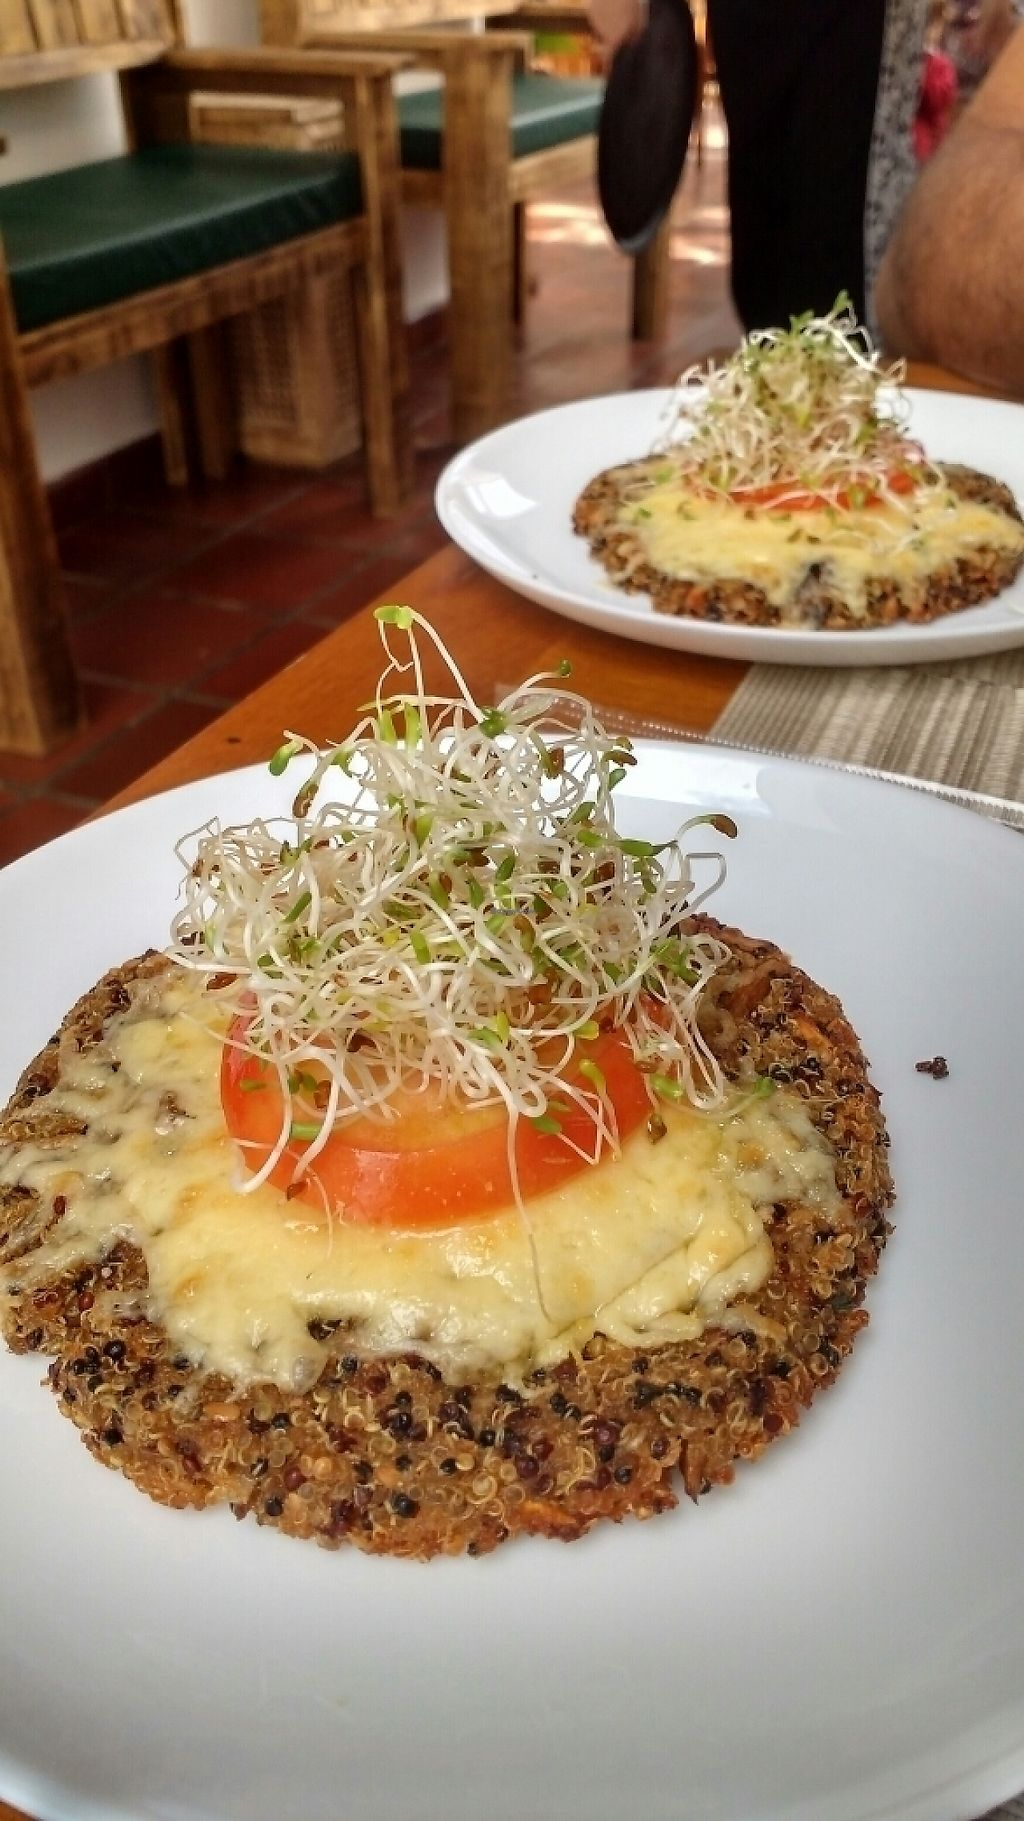 "Photo of Maluhia  by <a href=""/members/profile/silva_"">silva_</a> <br/>Quinoa and mushroom burger <br/> May 6, 2017  - <a href='/contact/abuse/image/73403/256349'>Report</a>"